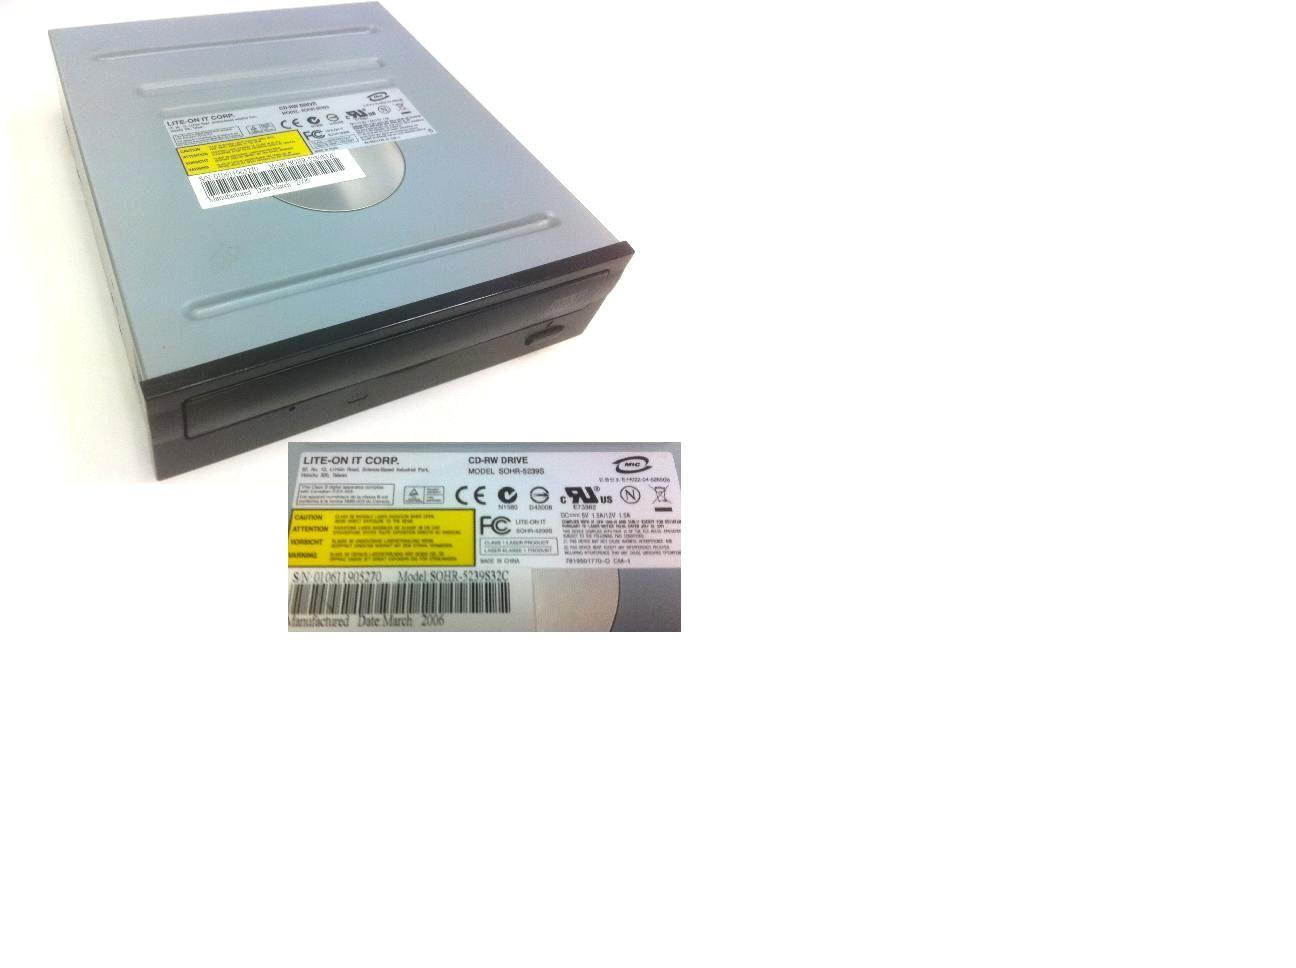 LiteOn SOHR-5239S32C Black CDRW 52X32X 5.25 inch IDE